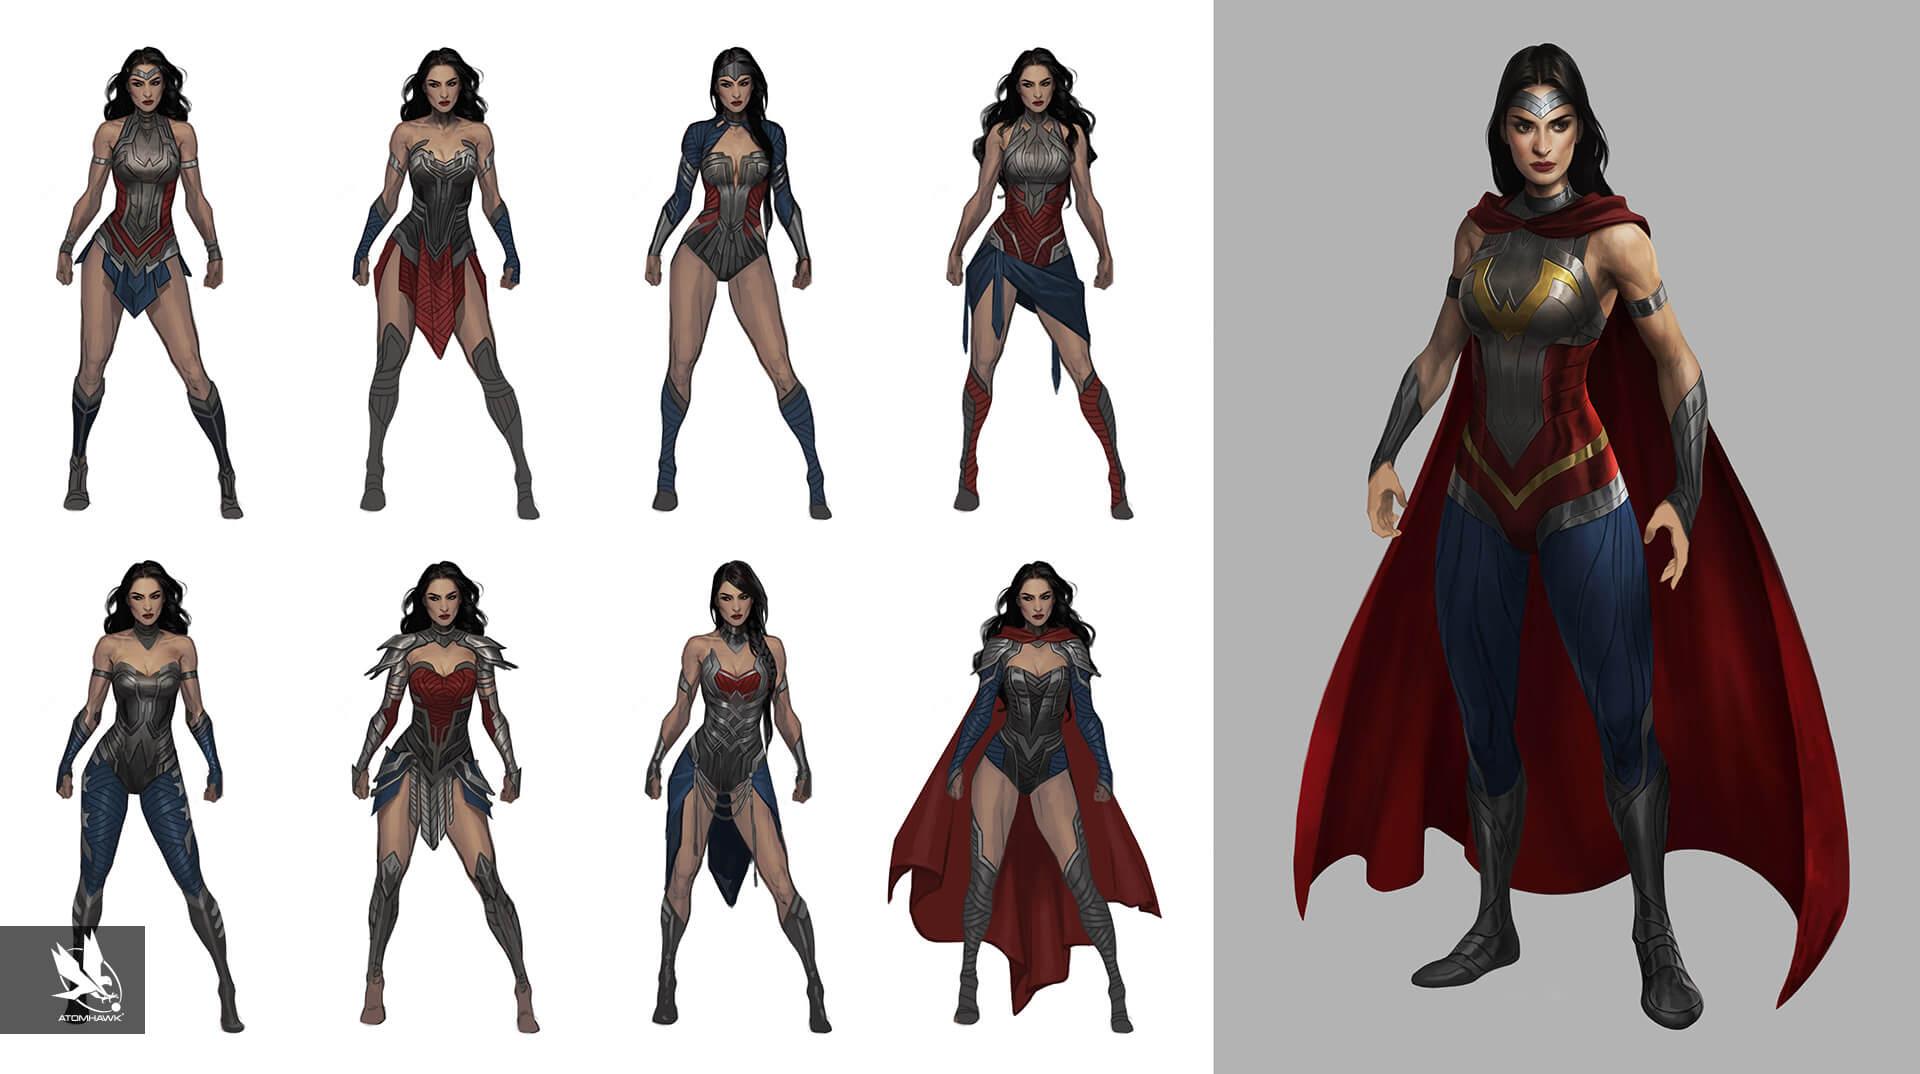 Atomhawk_Warner-Bros-NetherRealm_Injustice-2_Concept-Art_Character-Design_Wonder-Woman.jpg